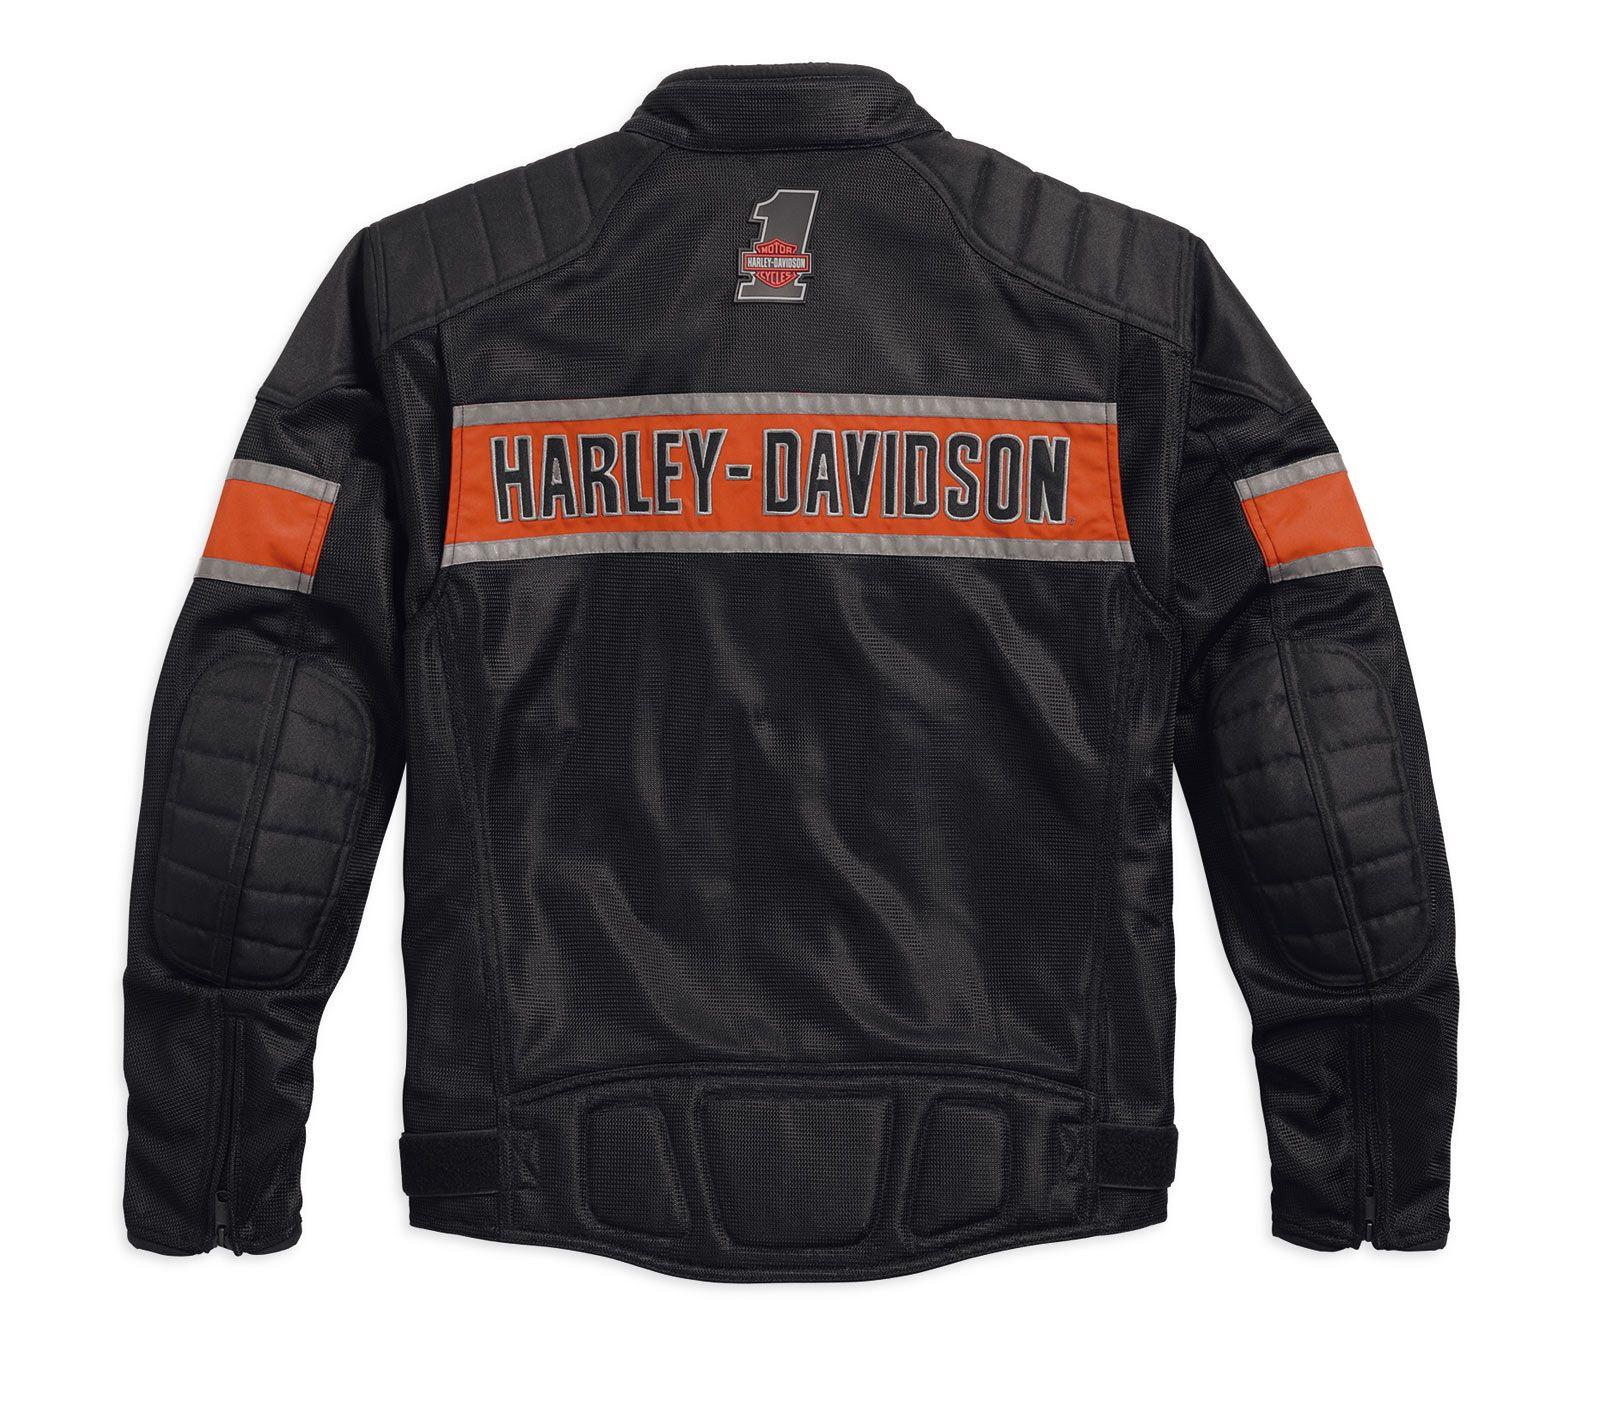 98111 16vm harley davidson motorradjacke trenton mesh im. Black Bedroom Furniture Sets. Home Design Ideas